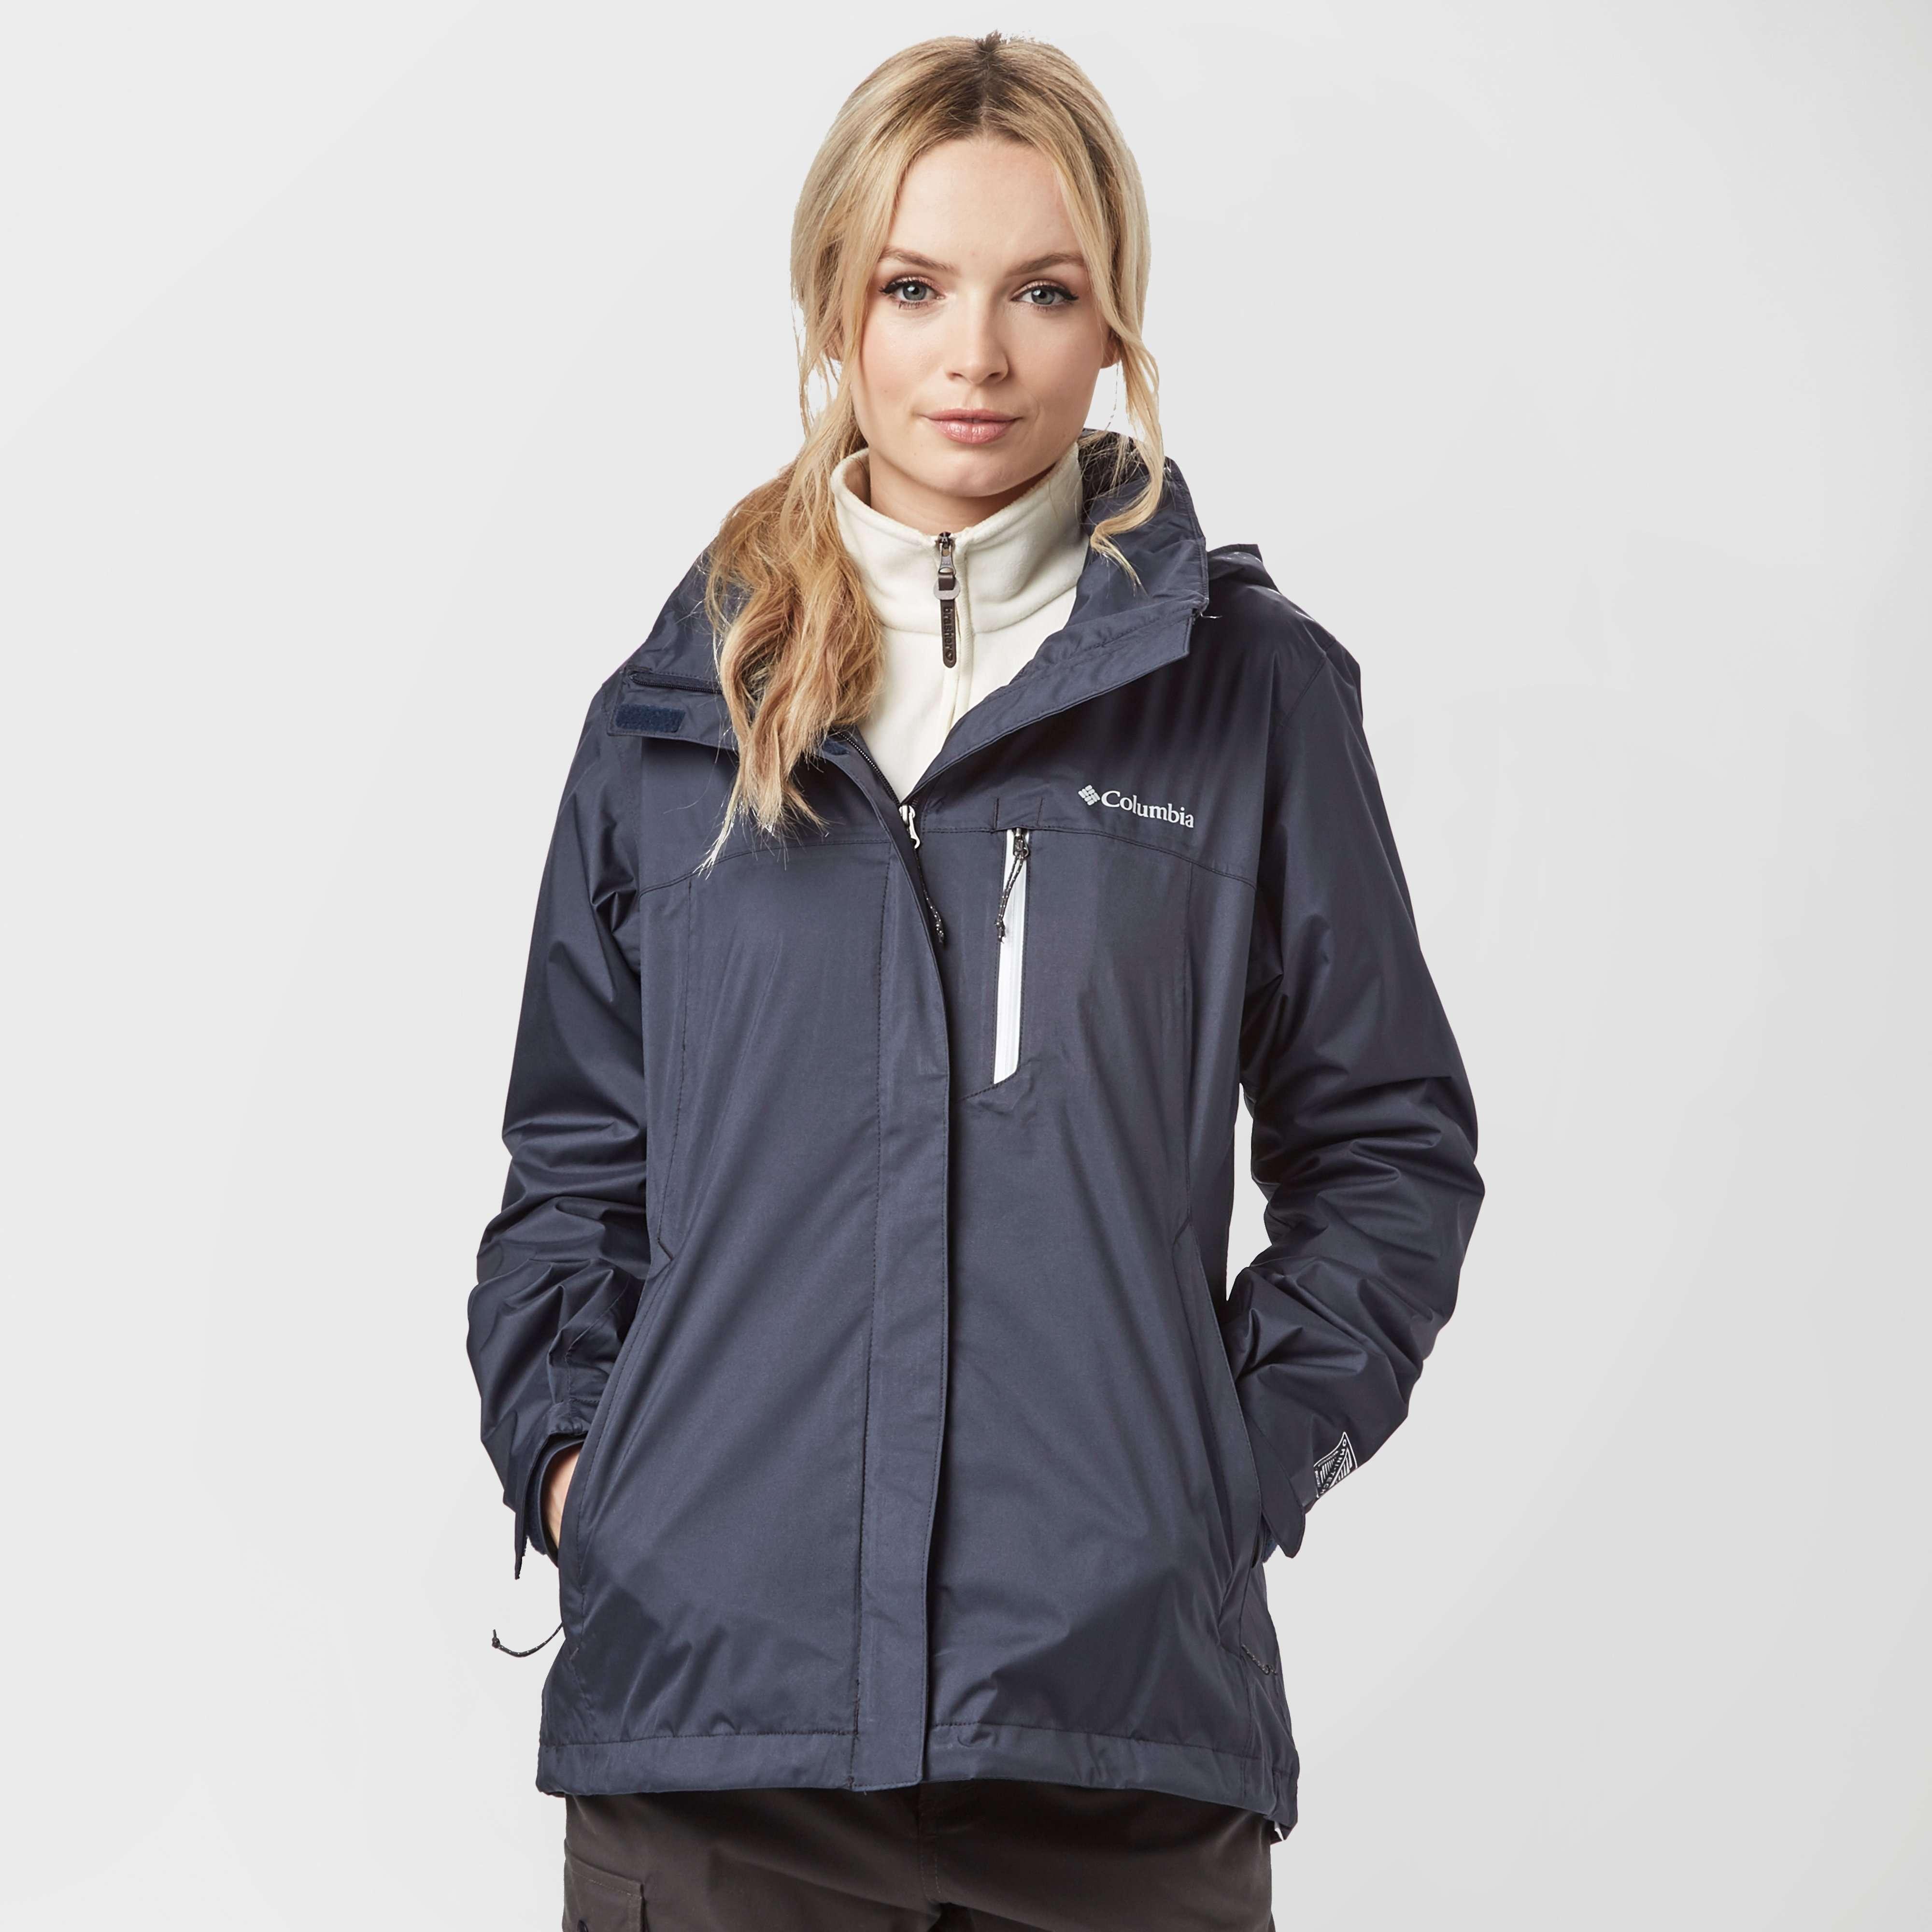 COLUMBIA Women's Pouration™ Waterproof Jacket